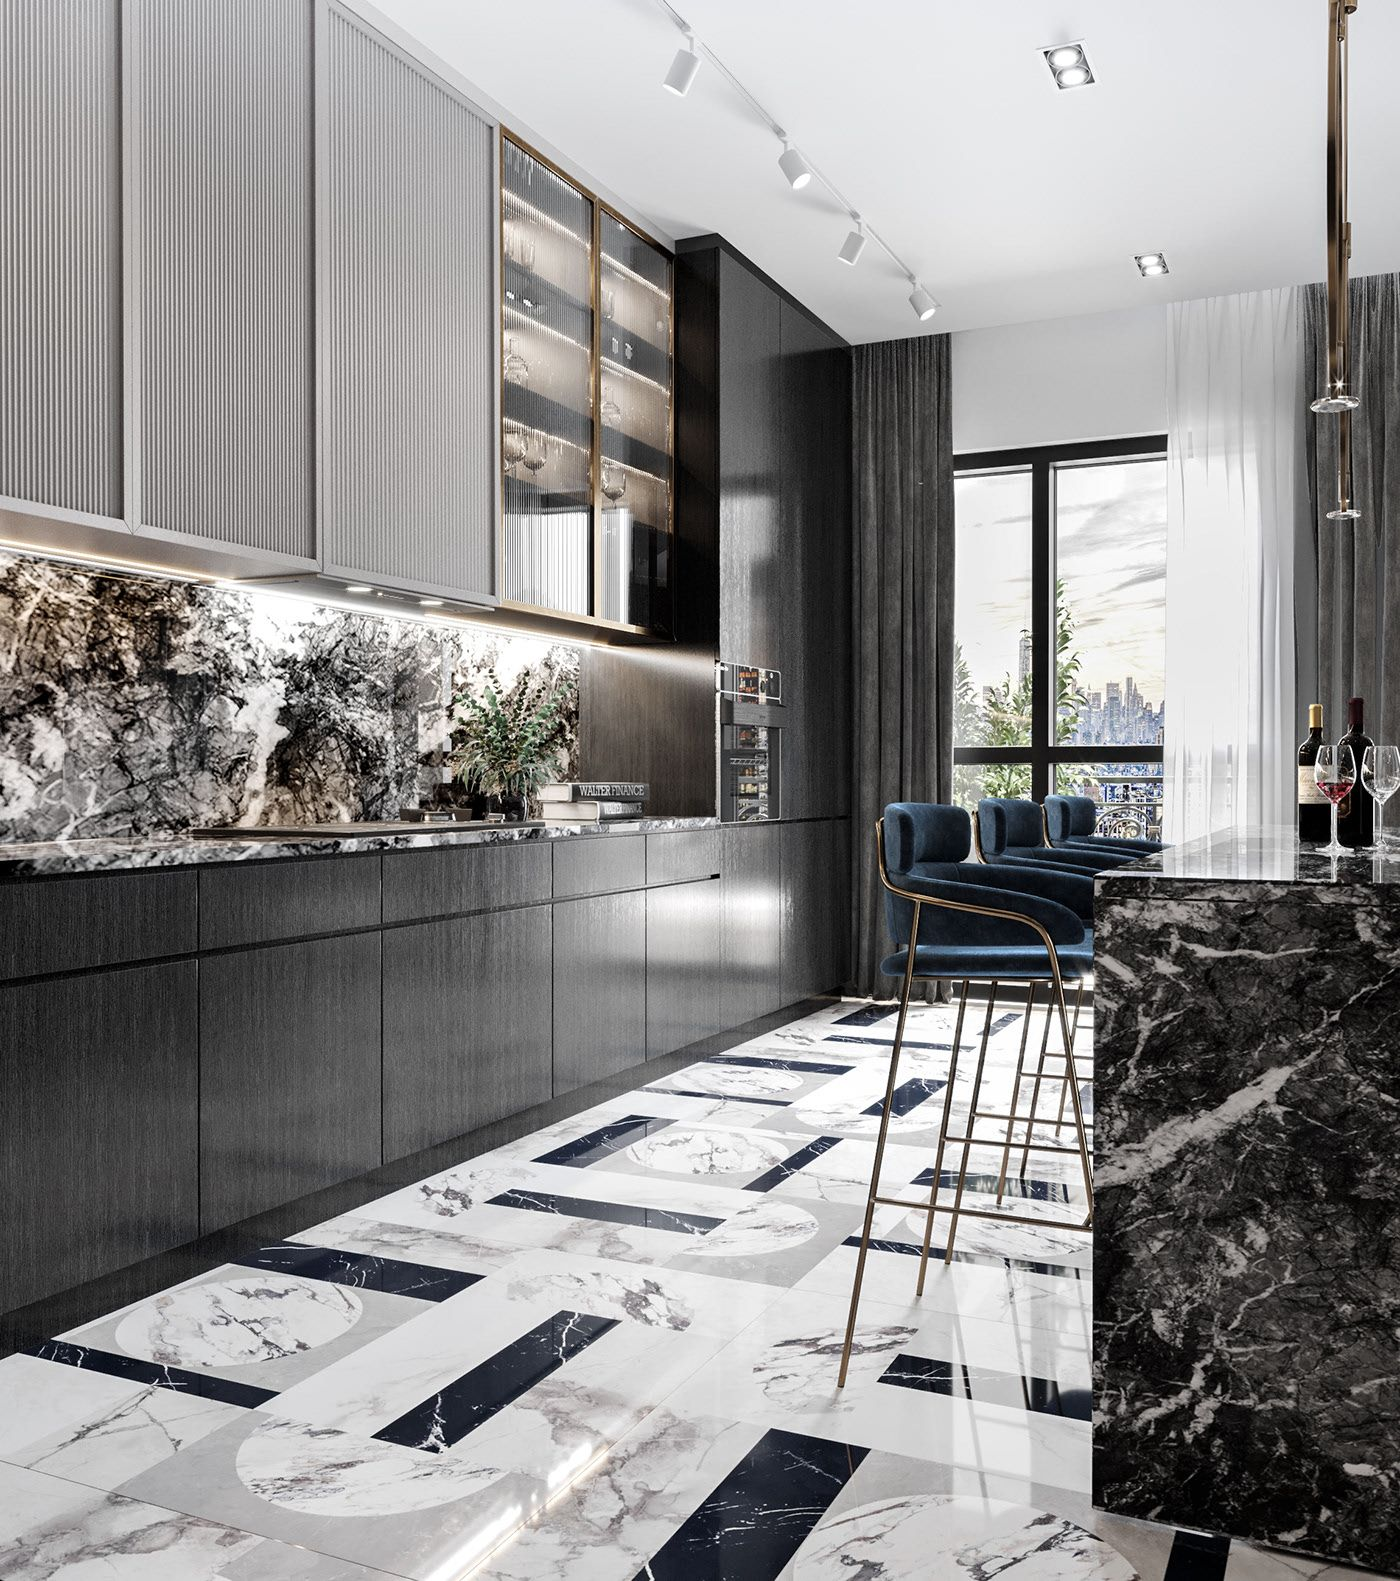 Deluxe Plaza Baku Azerbajan On Behance In 2020 Interior Architecture Design Interior Styling Interior Design Furniture